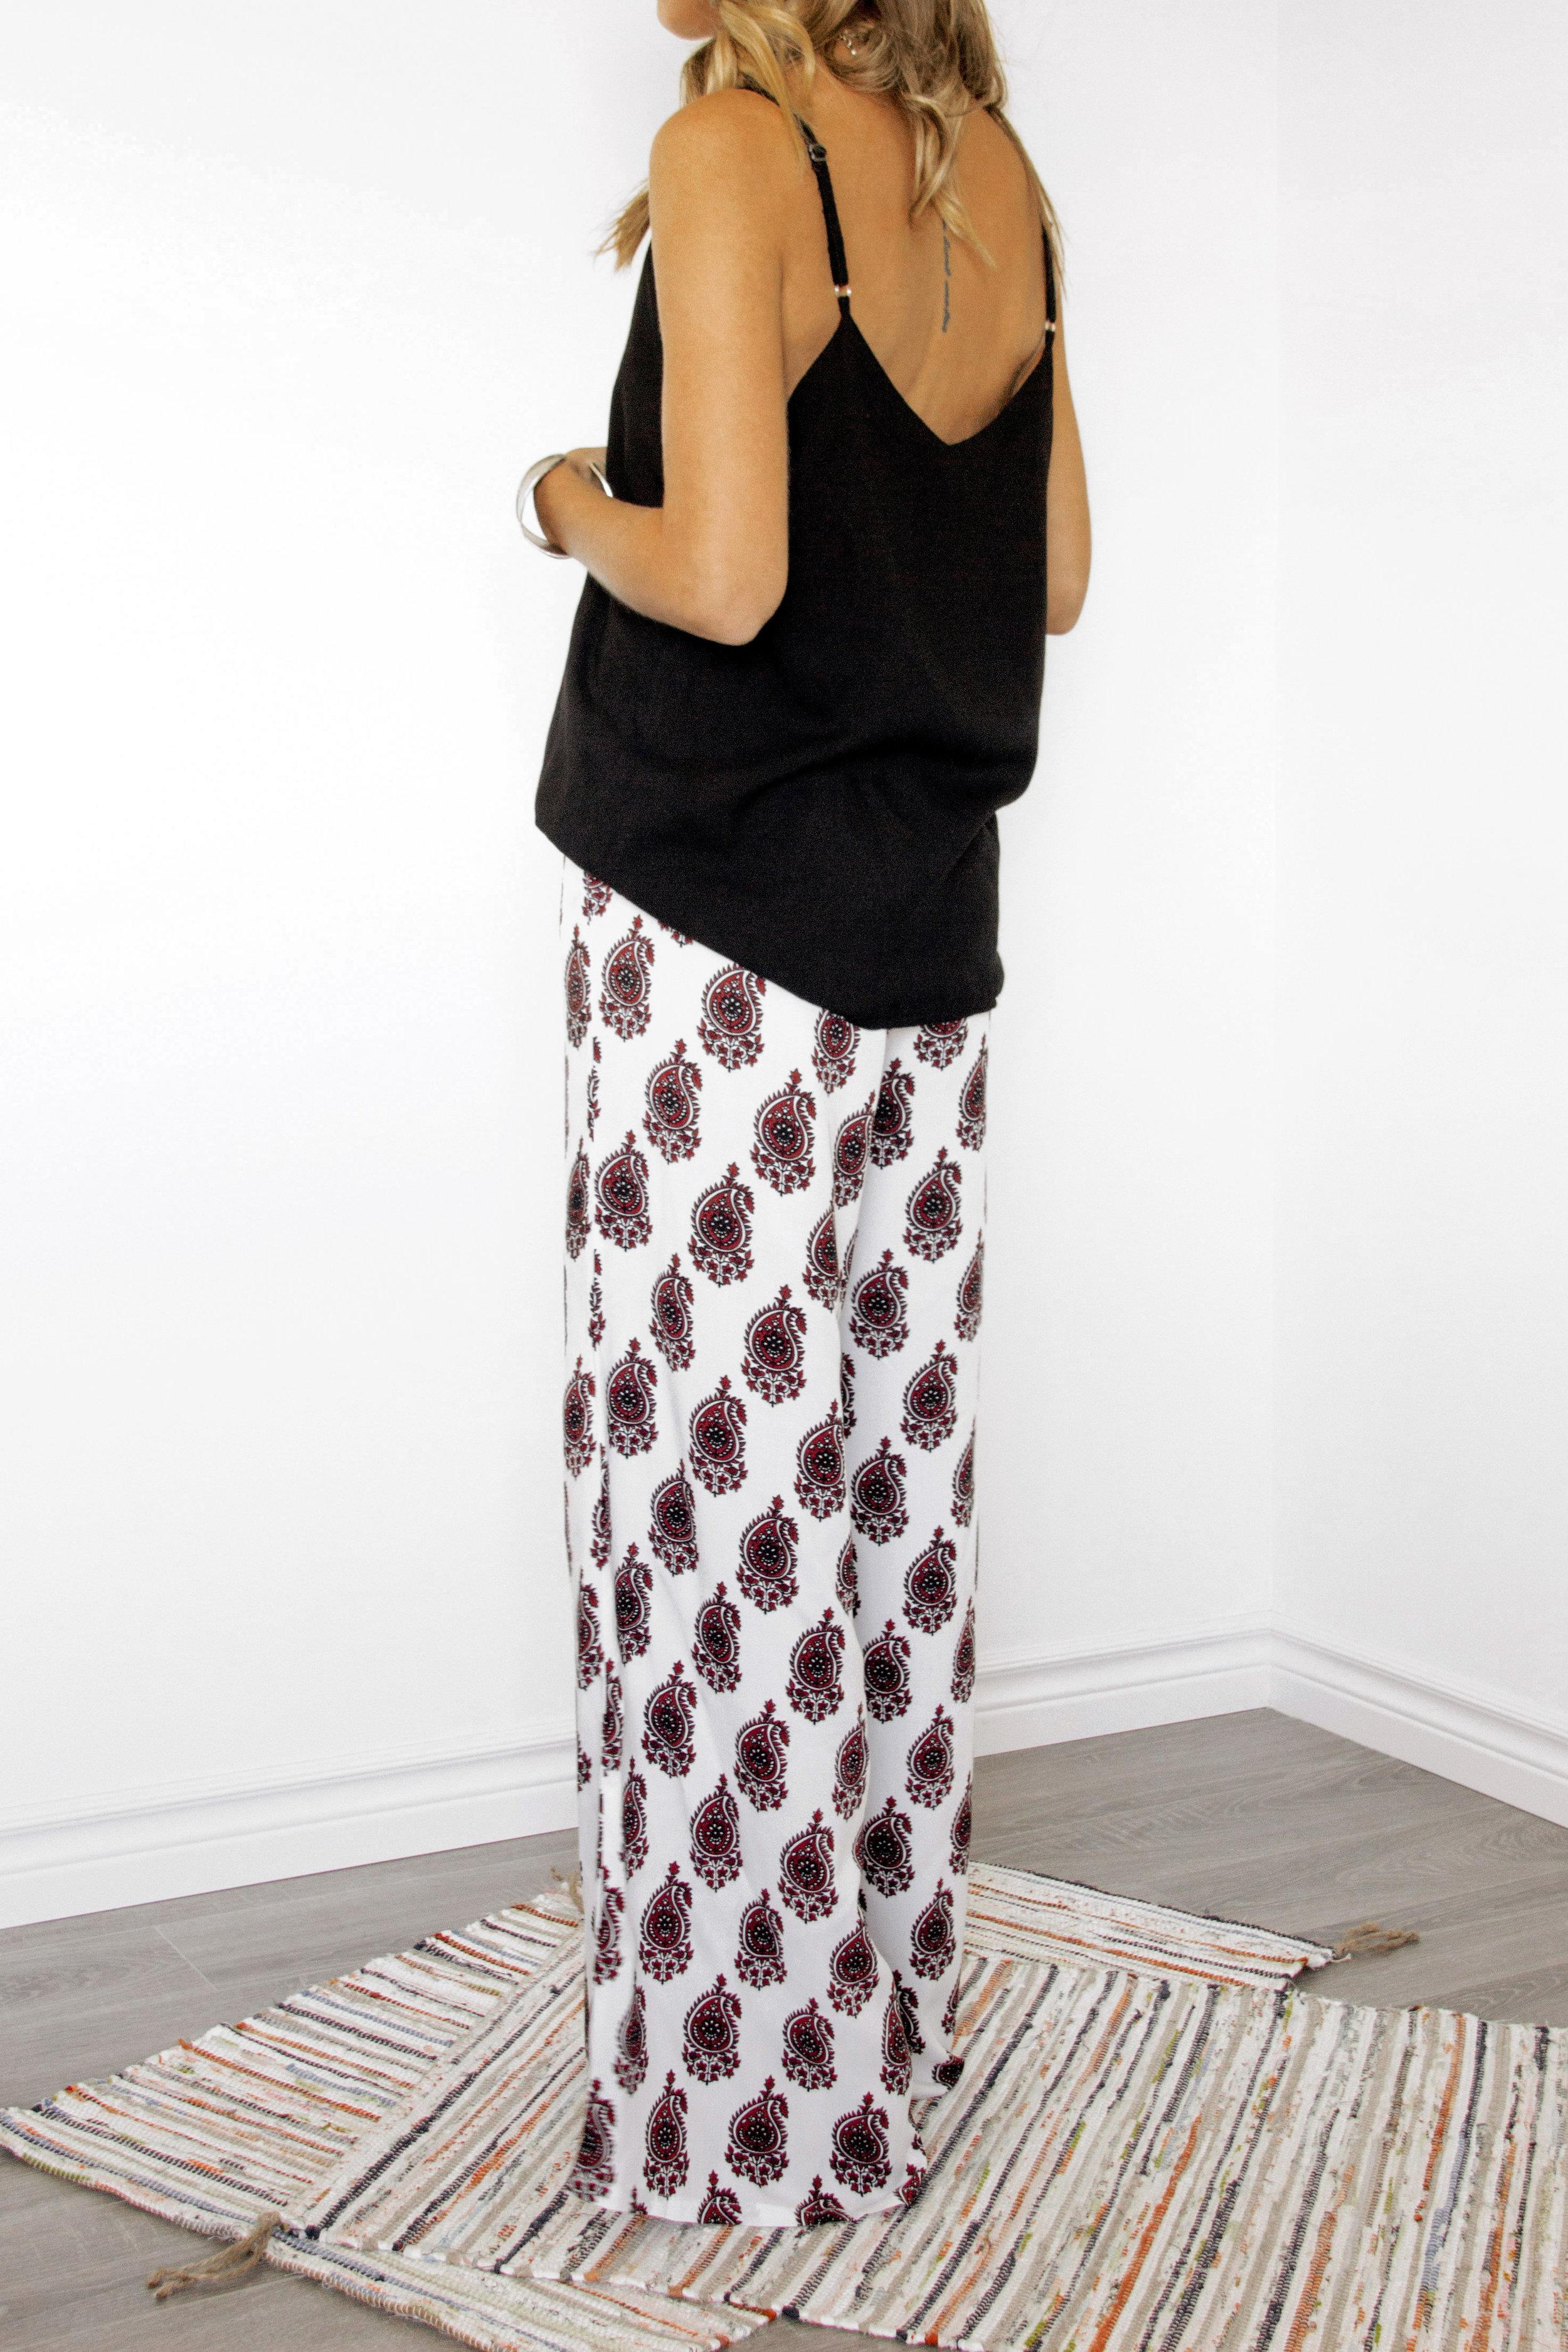 04.Wide-Leg-Pants.jpg